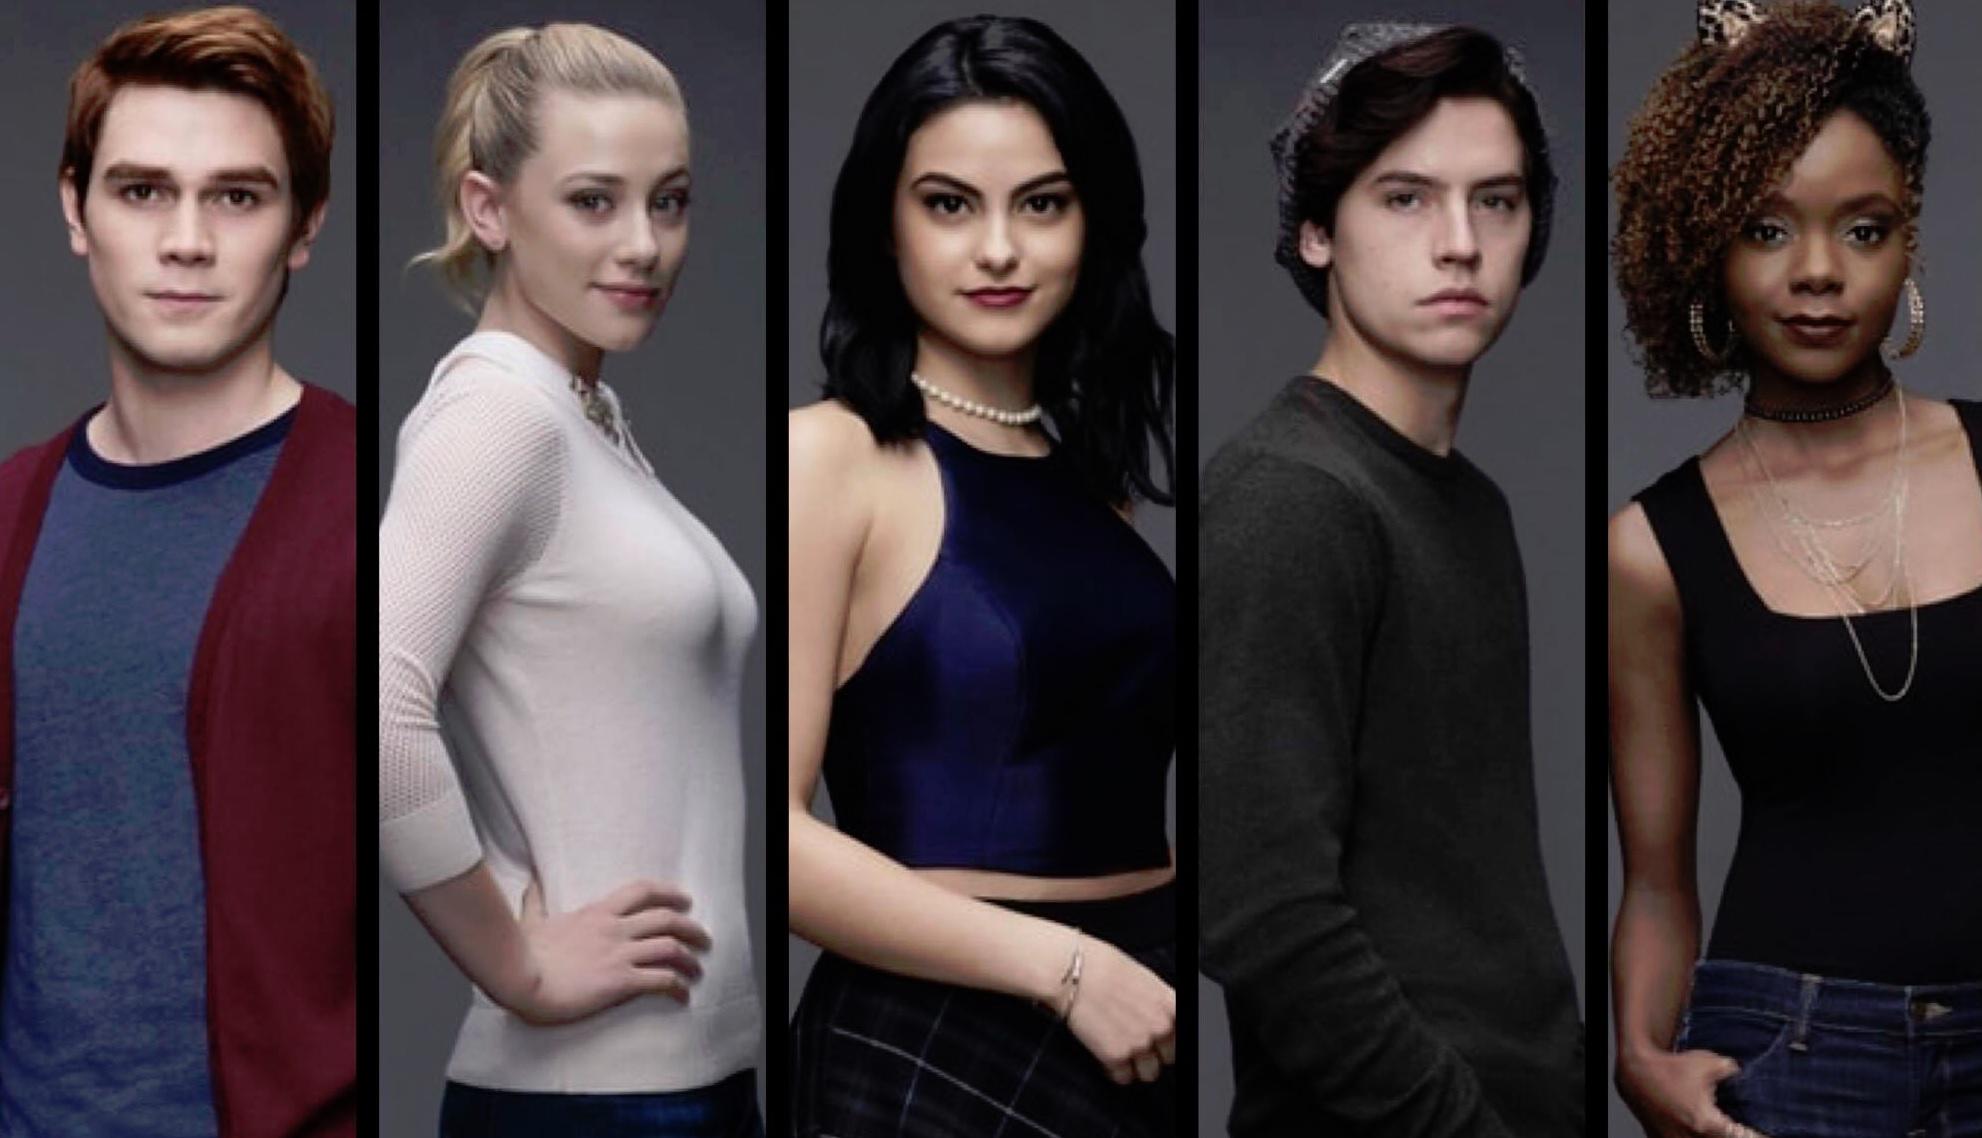 Elenco juvenil de Riverdale